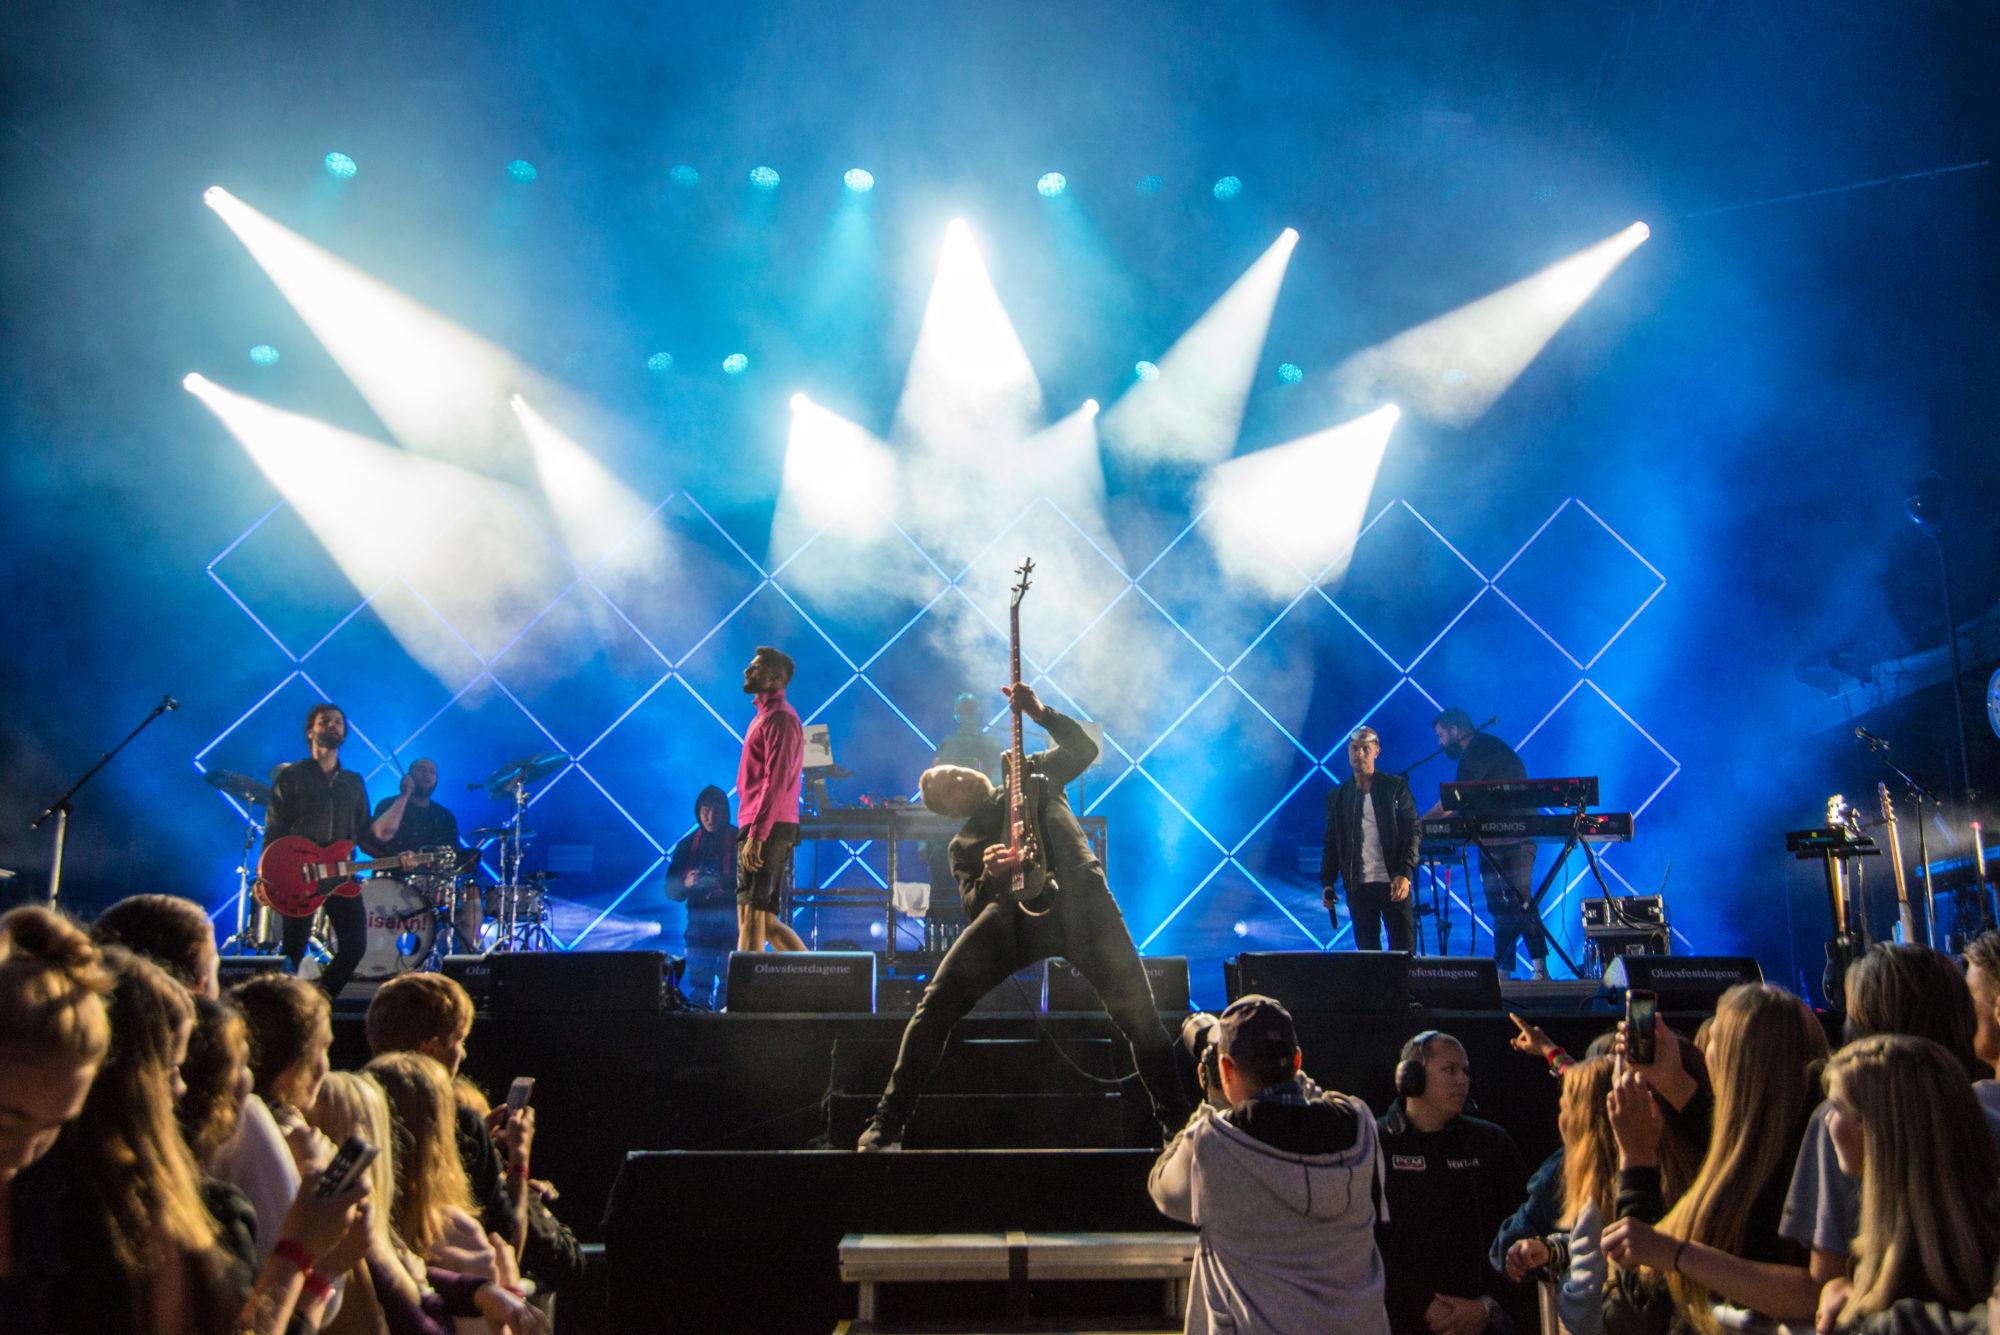 Karpe Diem konsert i Borggården. Foto: Siw Hermanstad / Olavfestdagene